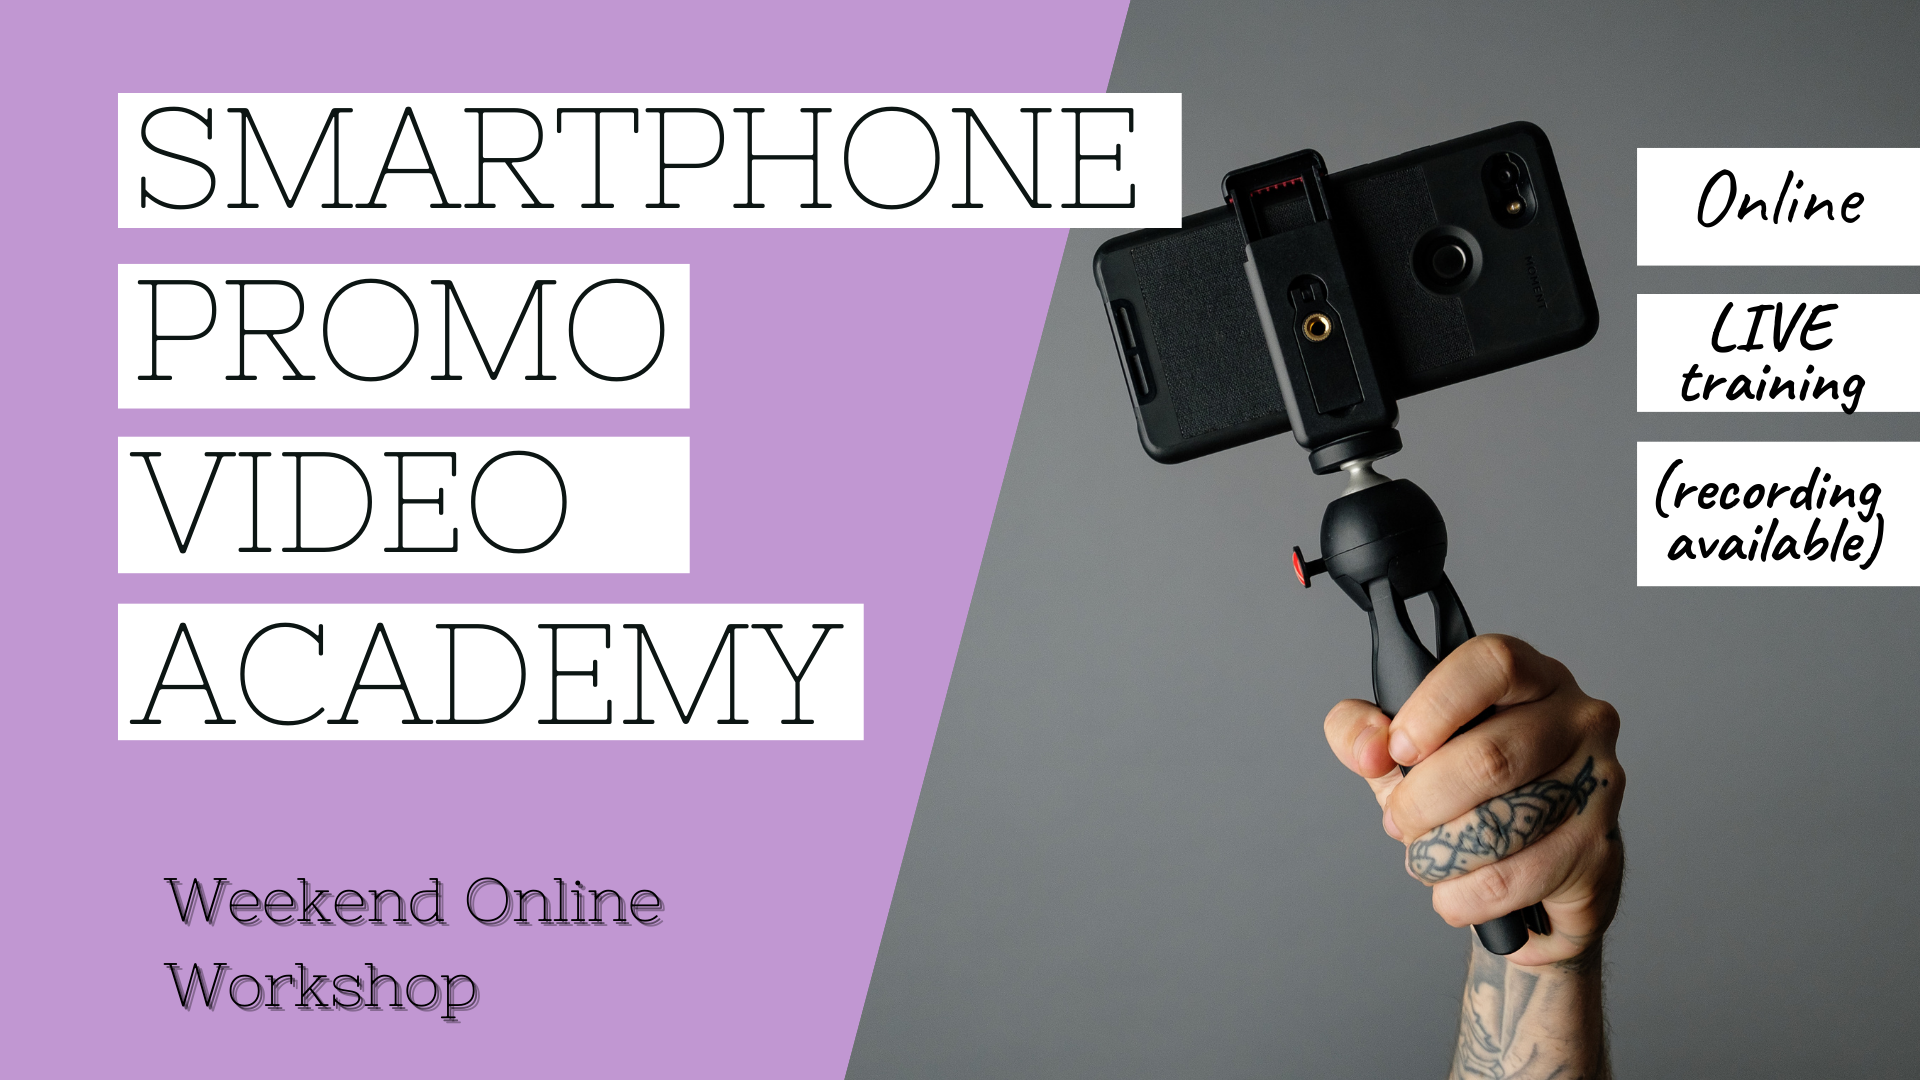 Online Workshop Promo Videos using smartphone ewa samples